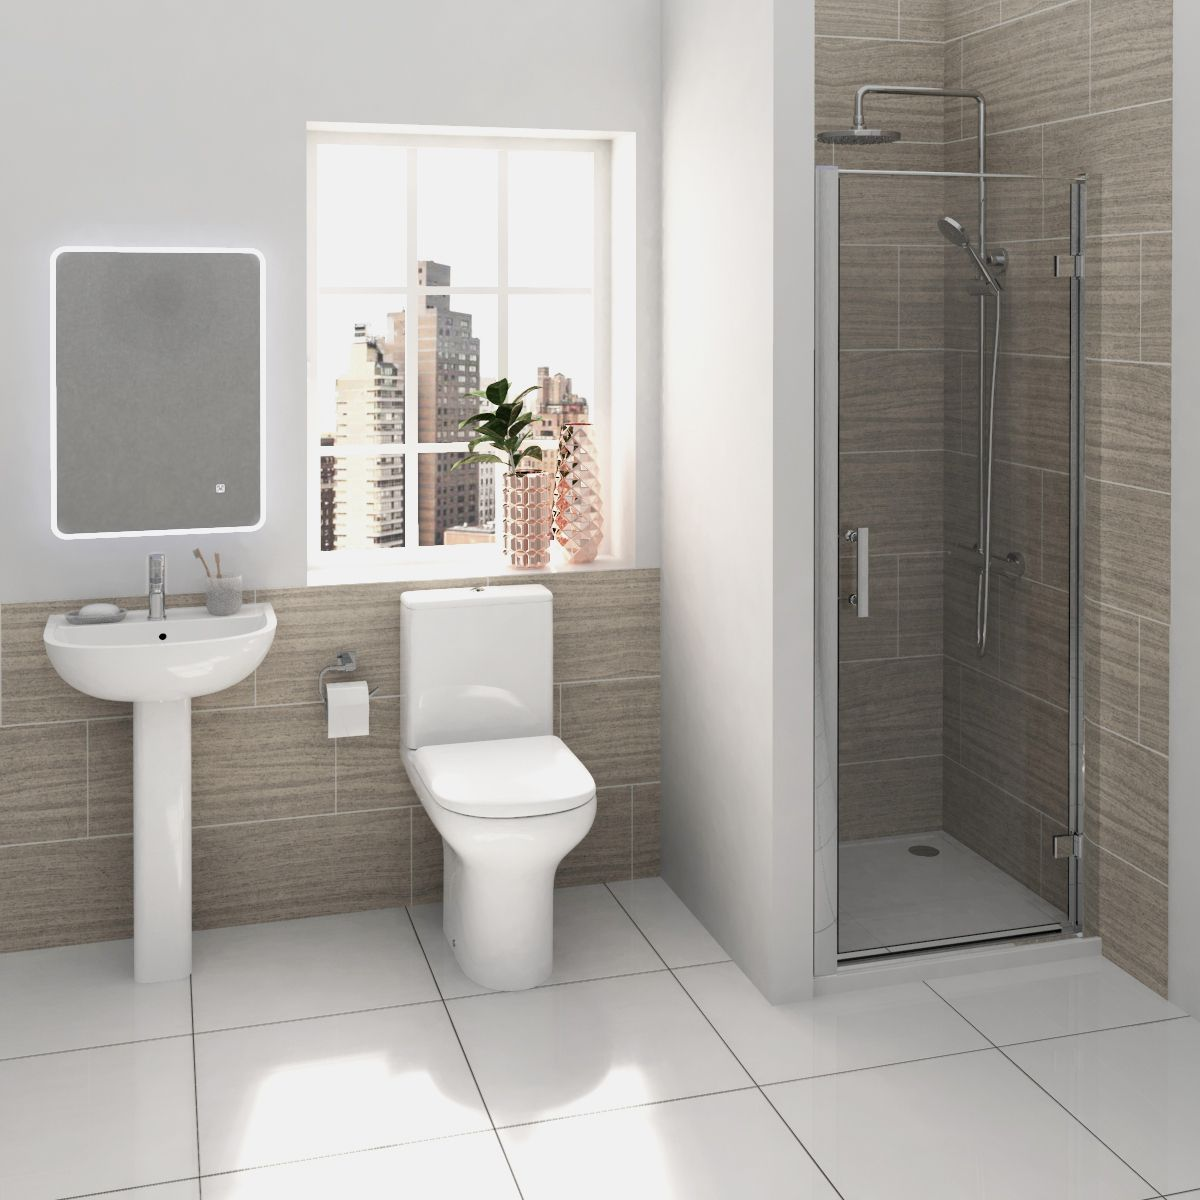 RAK Compact Shower Suite with Pacific Hinged Door Shower Enclosure Recess